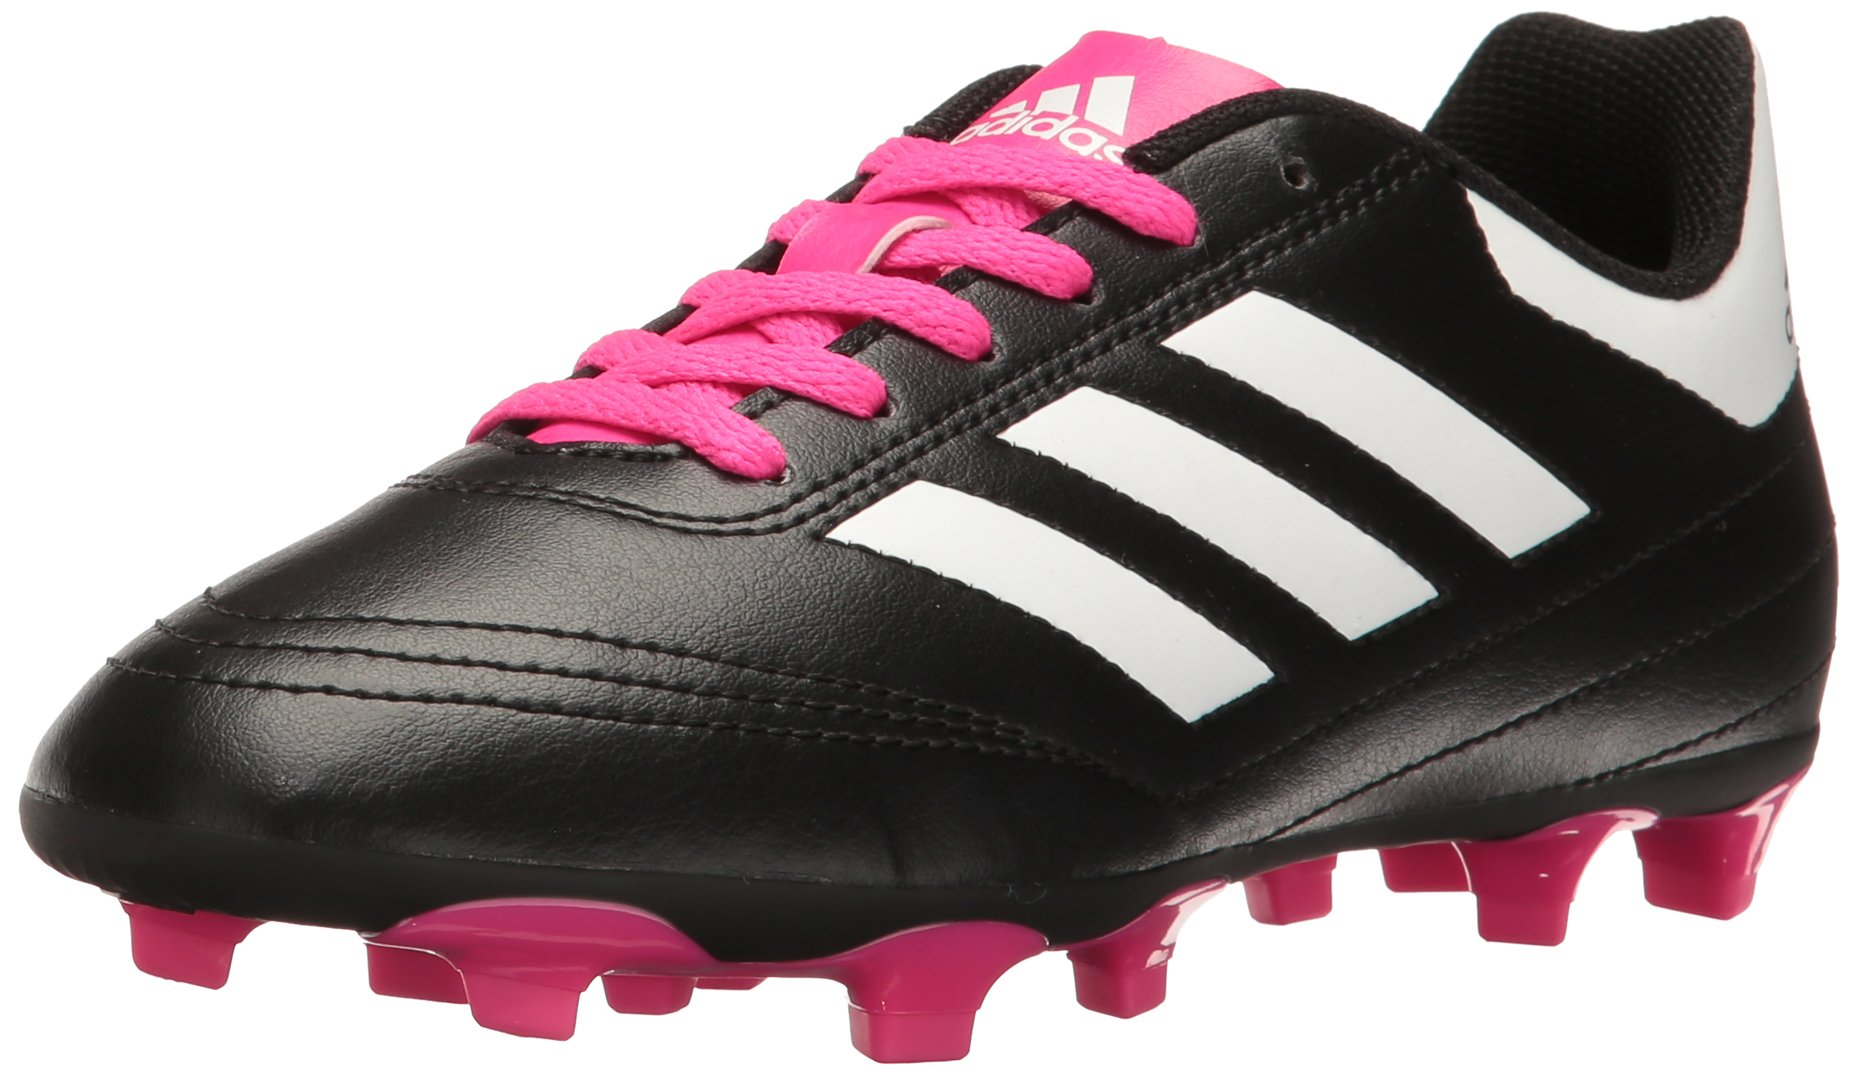 adidas Performance Kids' Goletto VI J Firm Ground Soccer Cleats, Black/White/Shopin, 3.5 Medium US Little Kid